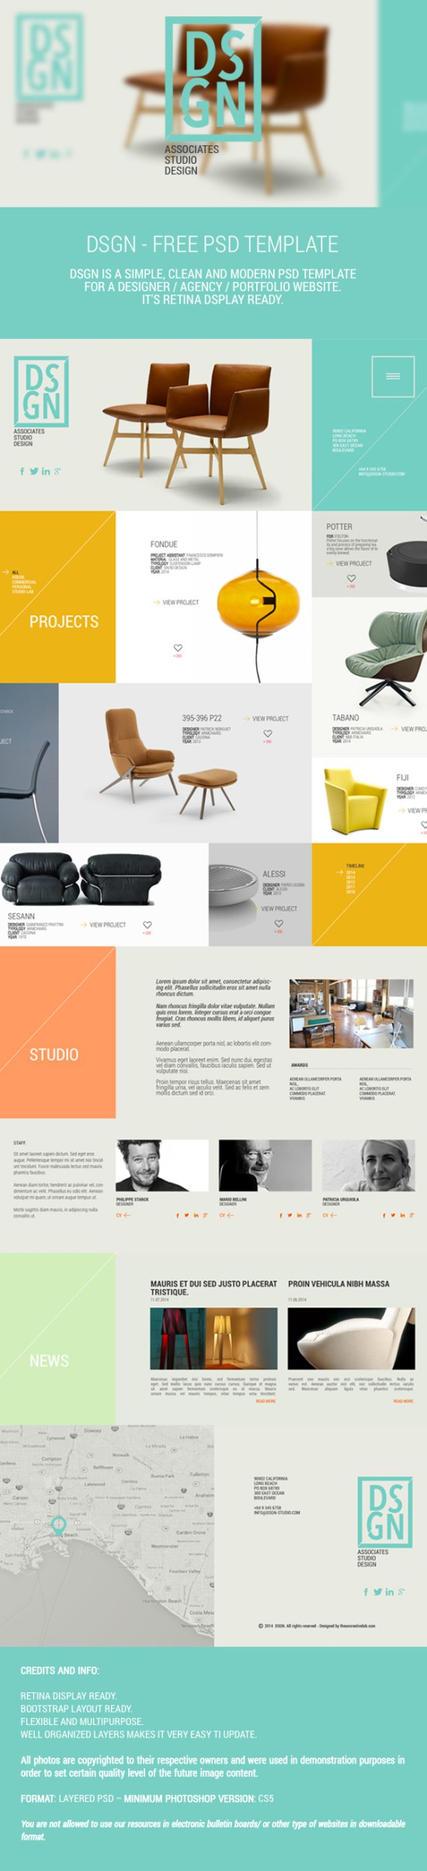 Free PSD Website Theme Template by Designhub719 on DeviantArt